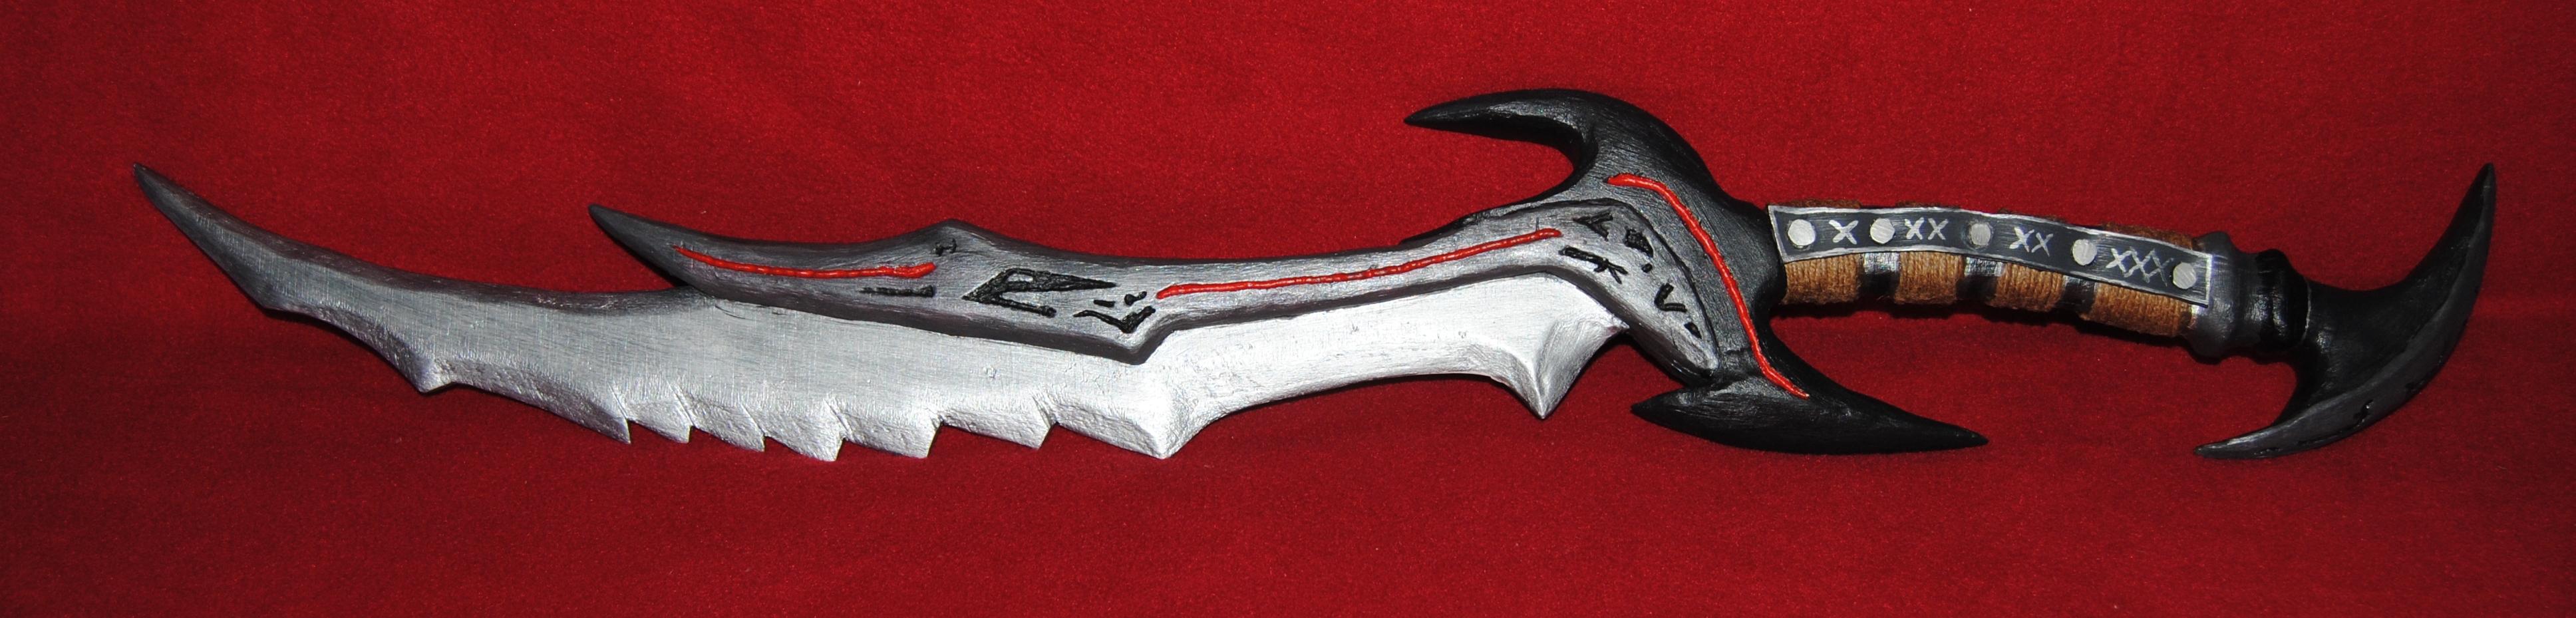 Skyrim: Daedric Sword